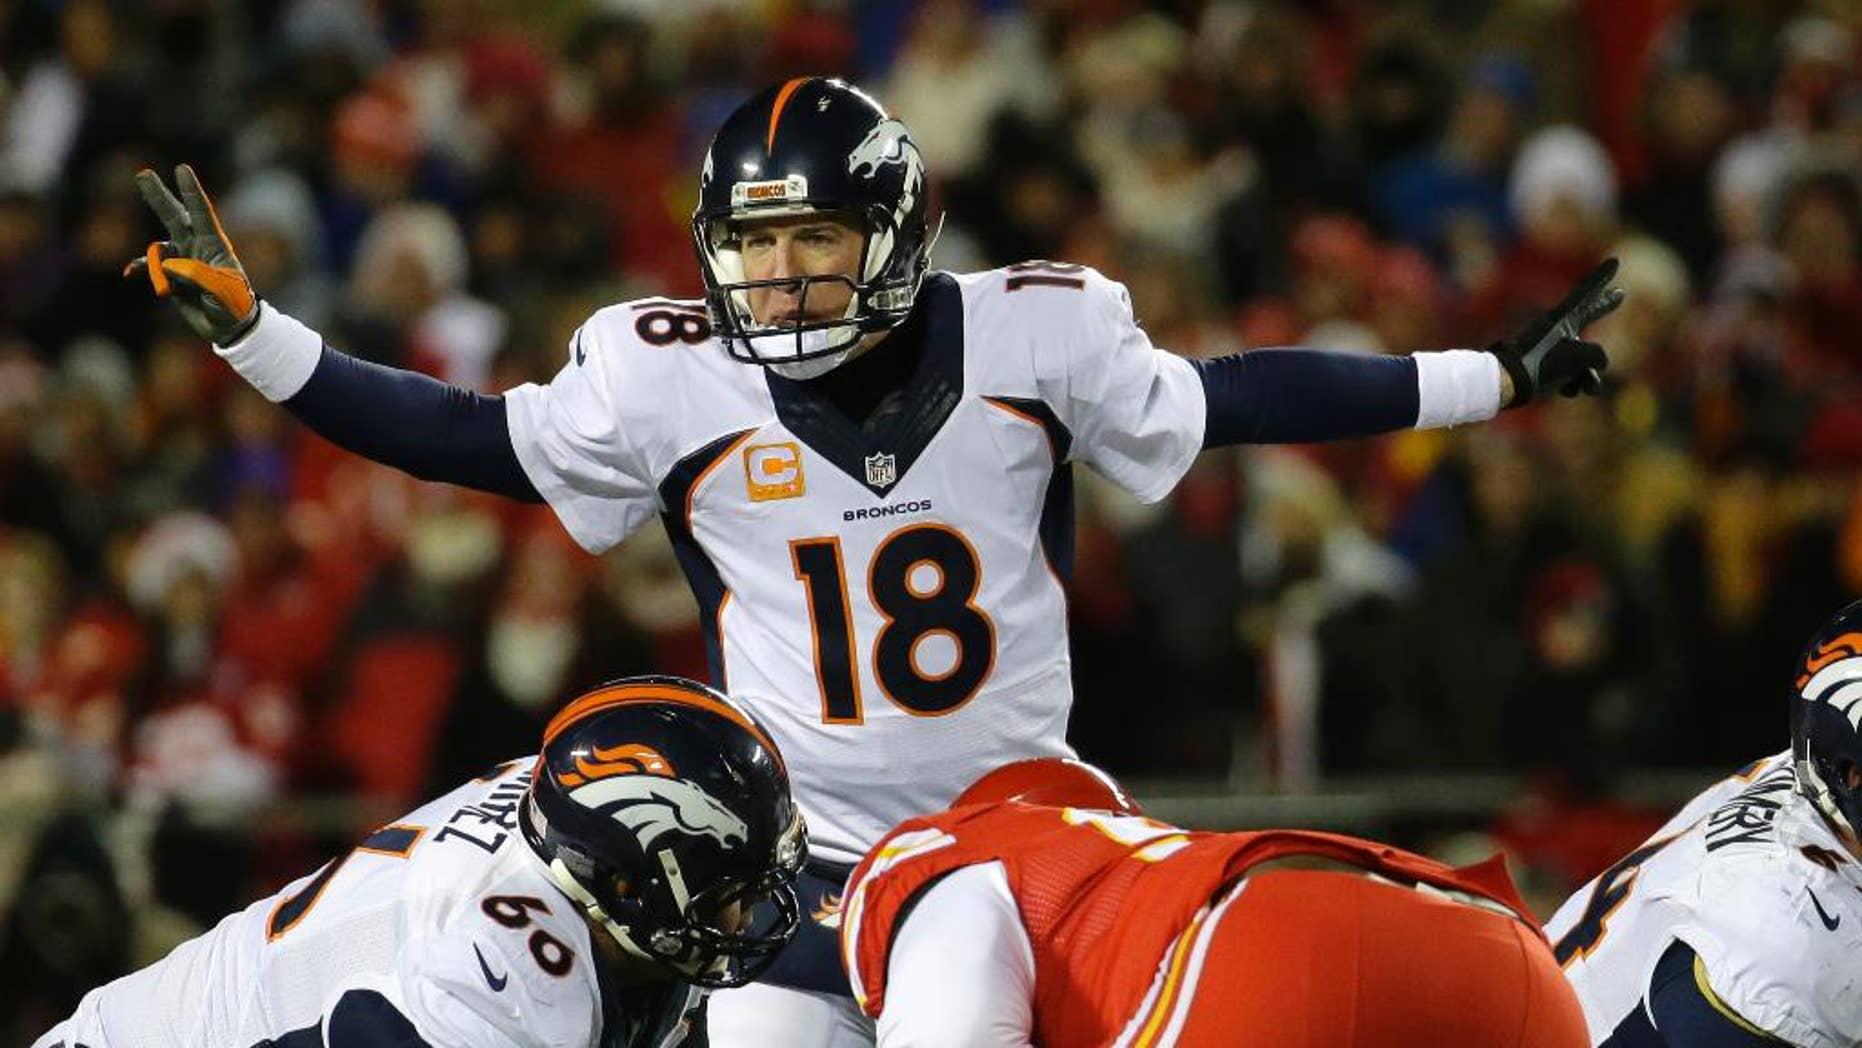 Denver Broncos running back C.J. Anderson (22) runs past Kansas City Chiefs outside linebacker Justin Houston (50) in the first half of an NFL football game in Kansas City, Mo., Sunday, Nov. 30, 2014. (AP Photo/Ed Zurga)